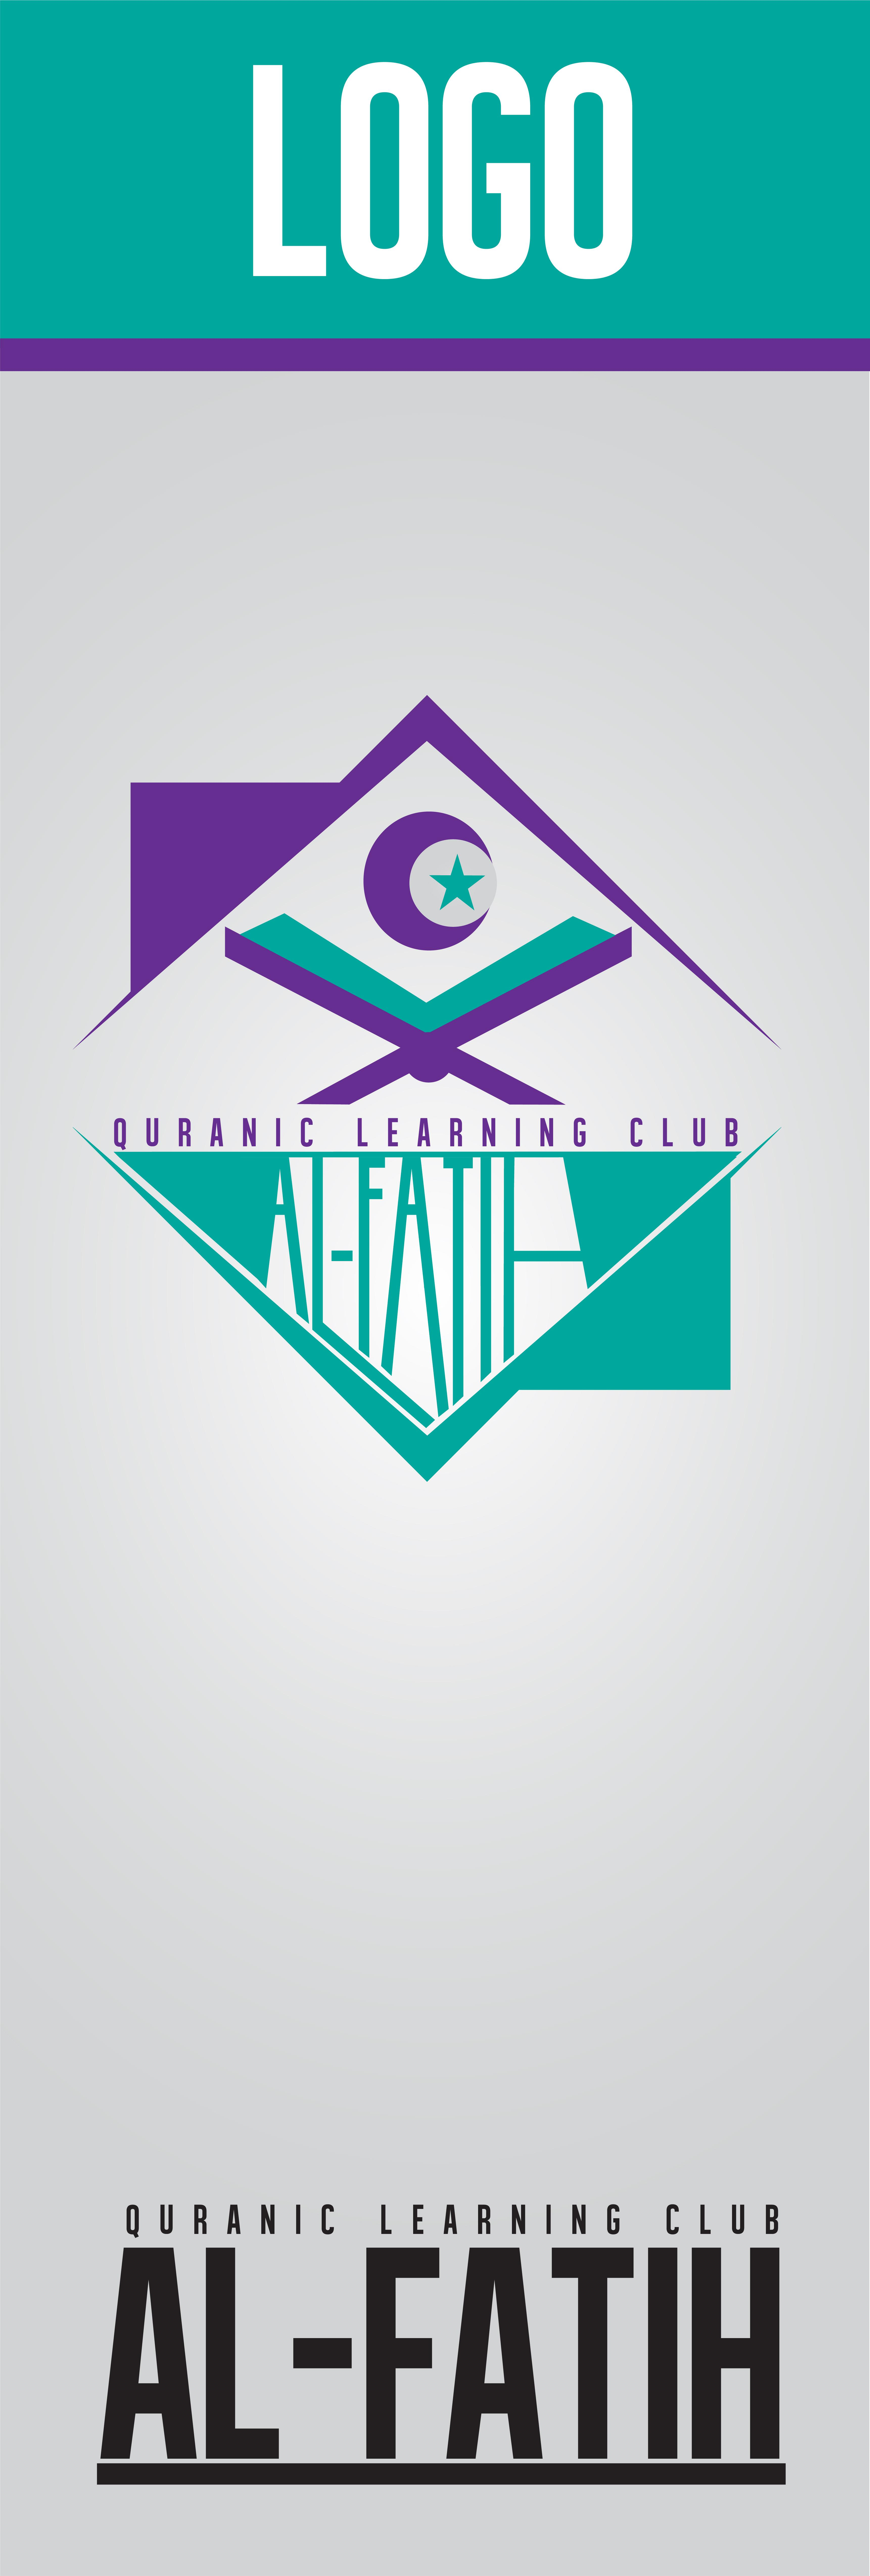 al-hidayah corporation sdn bhd Logo photo - 1